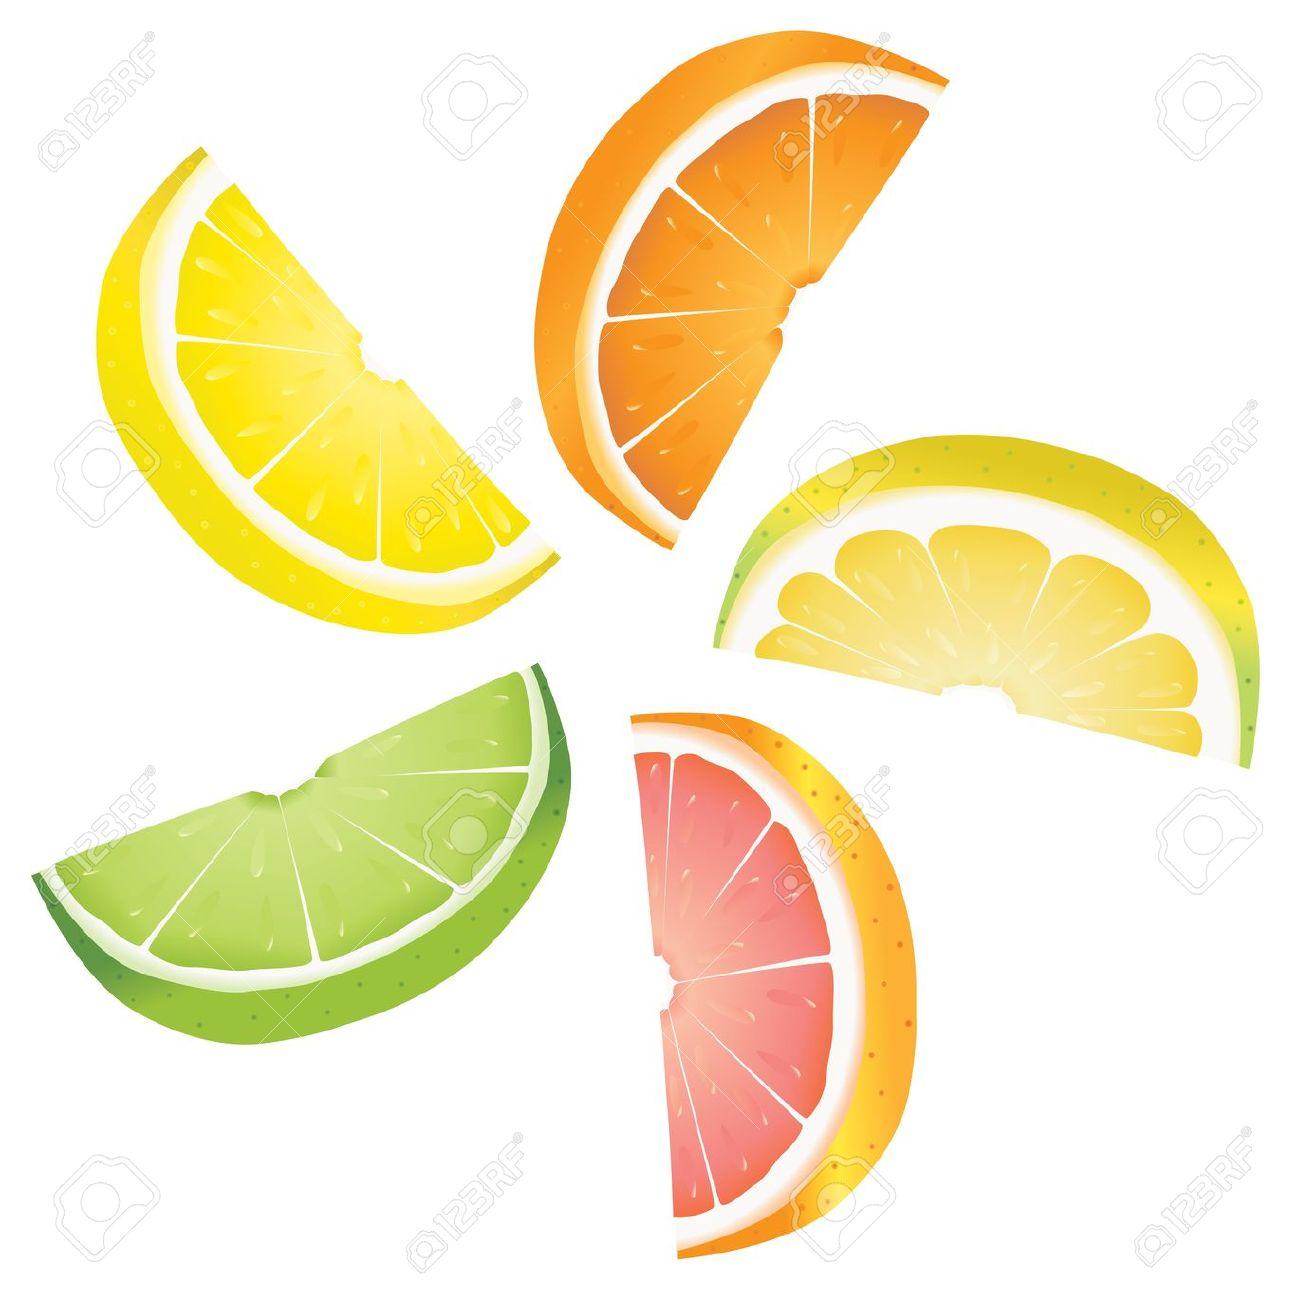 Lemon Slices Clipart | Free download best Lemon Slices